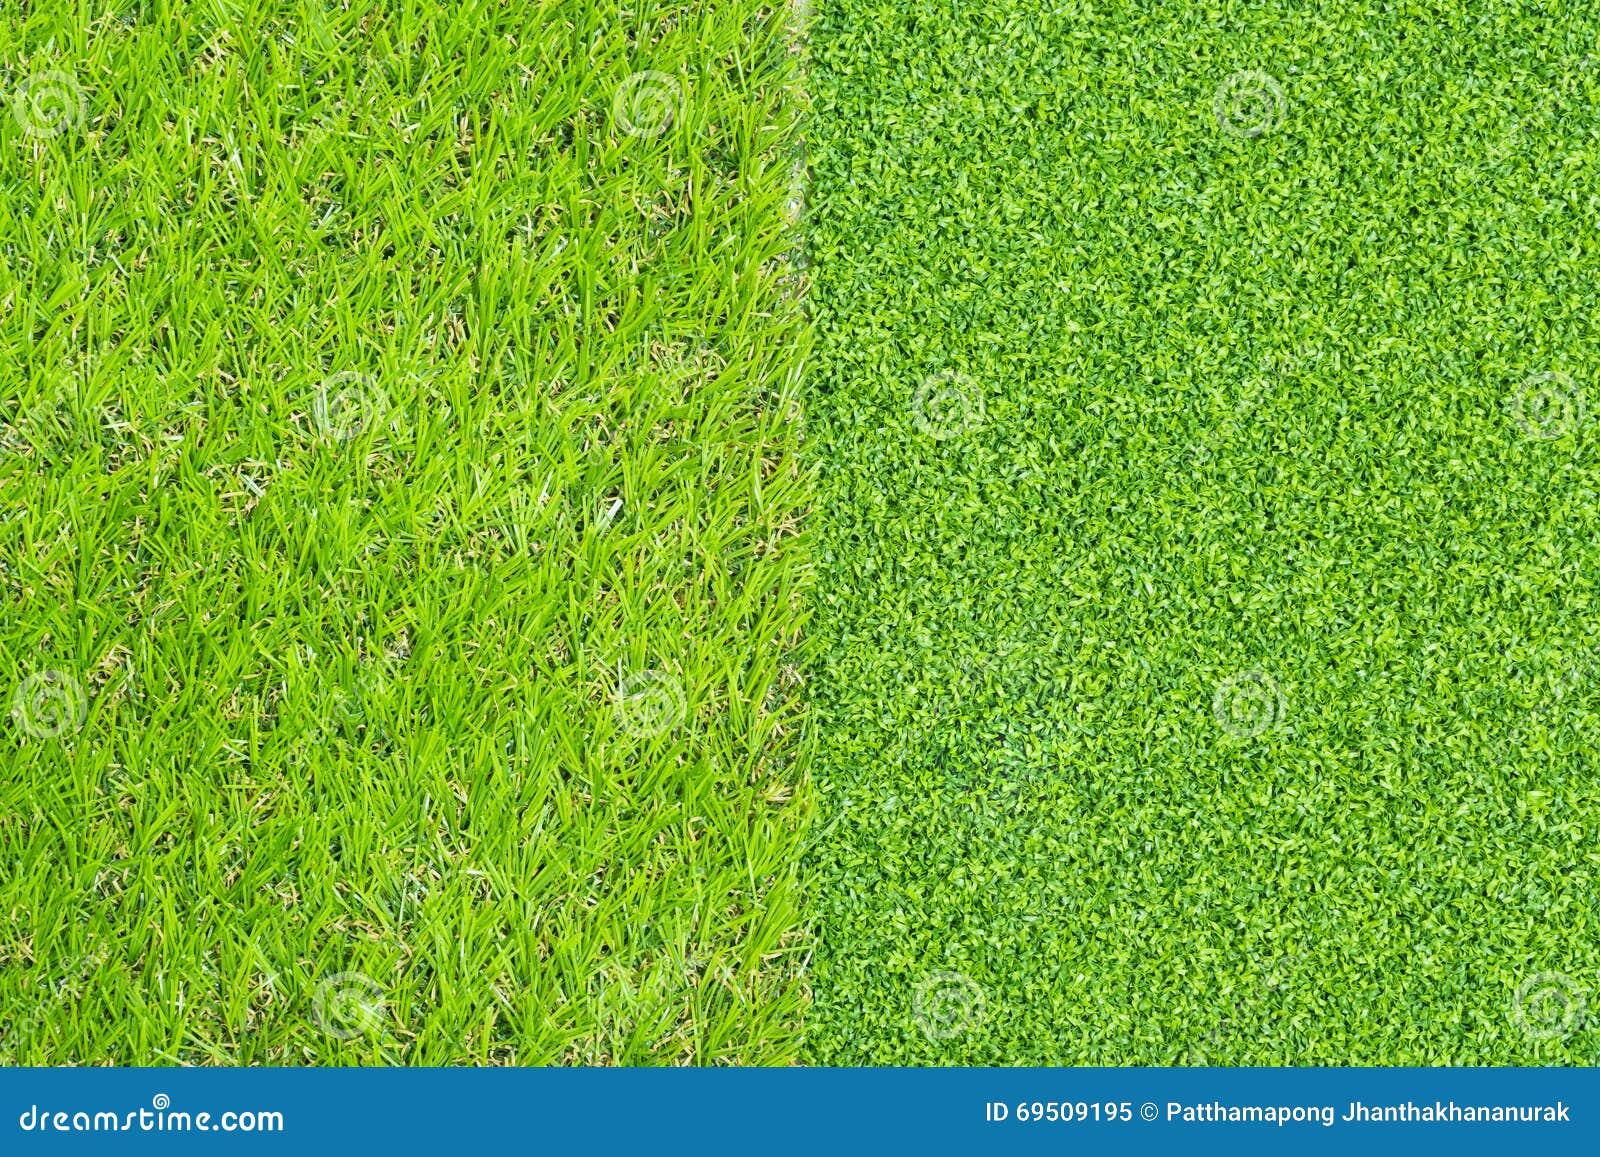 artificial grass texture. Artificial Grass Texture. Meadow, Line. Texture